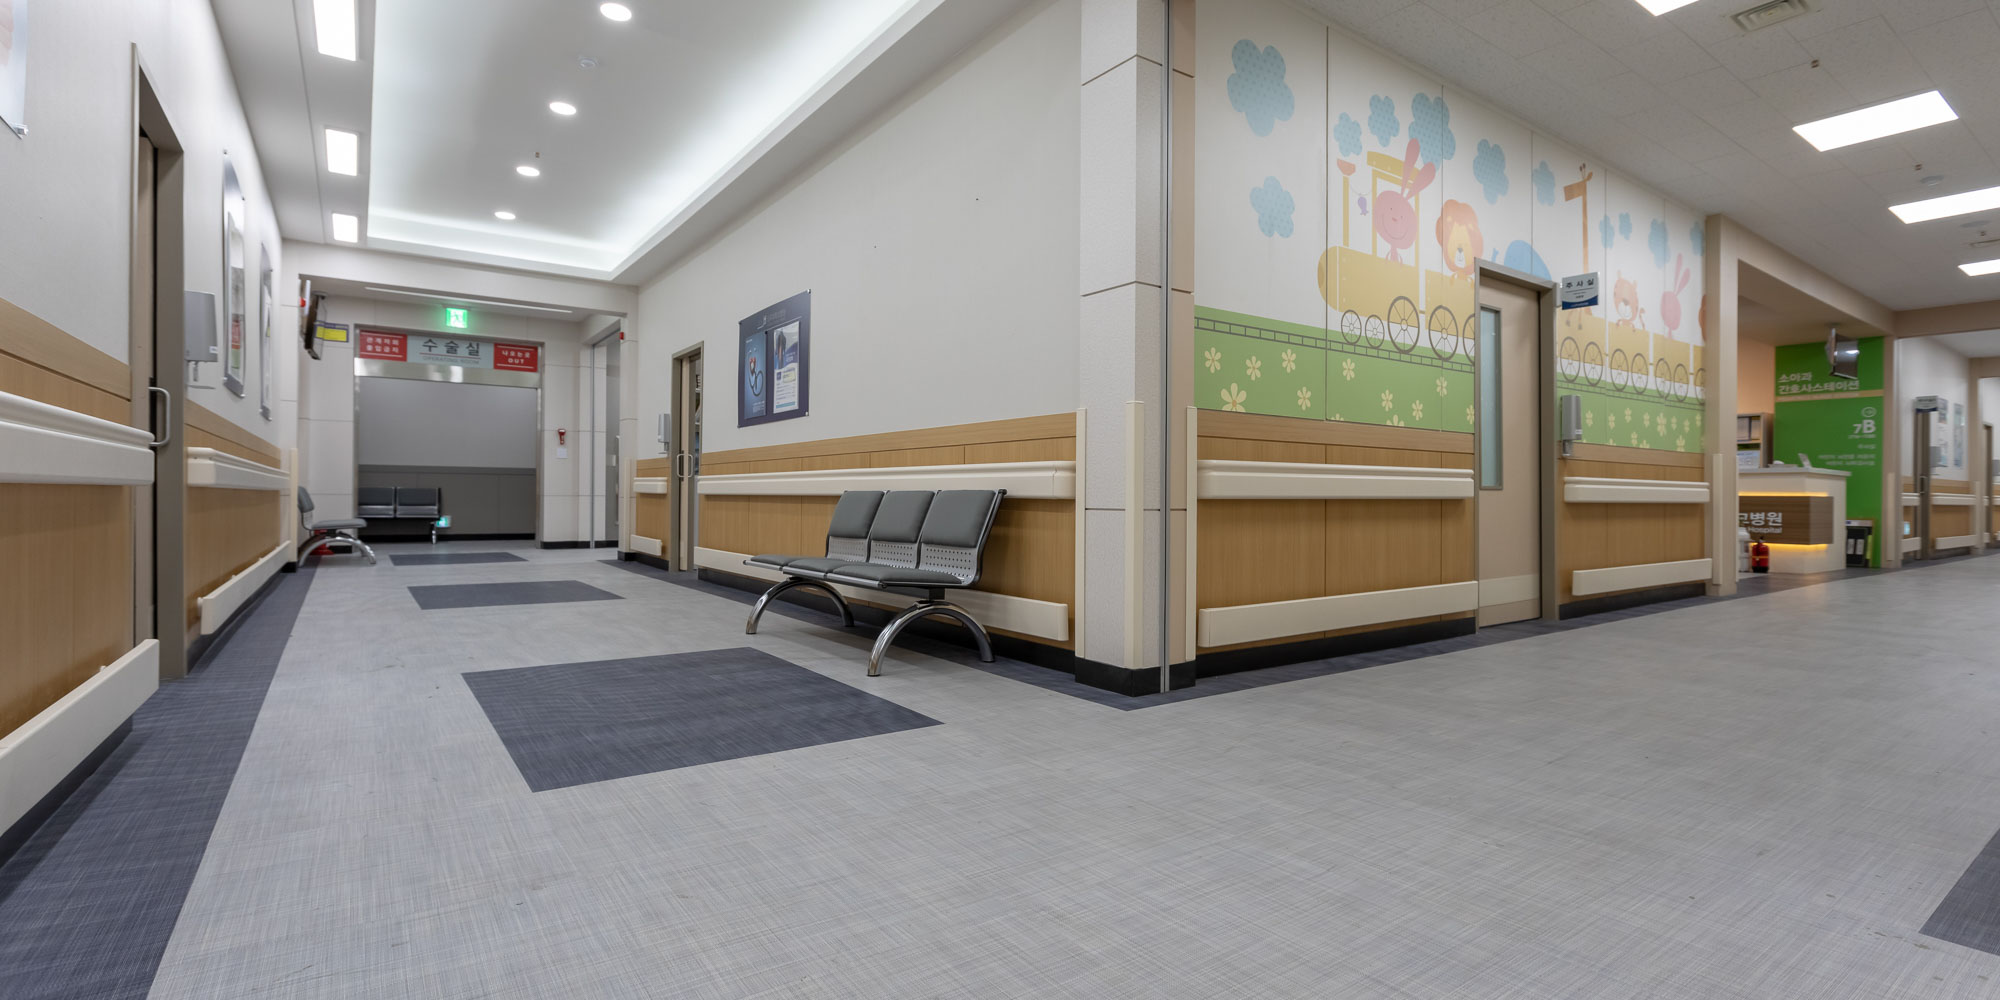 children's hospital hallway